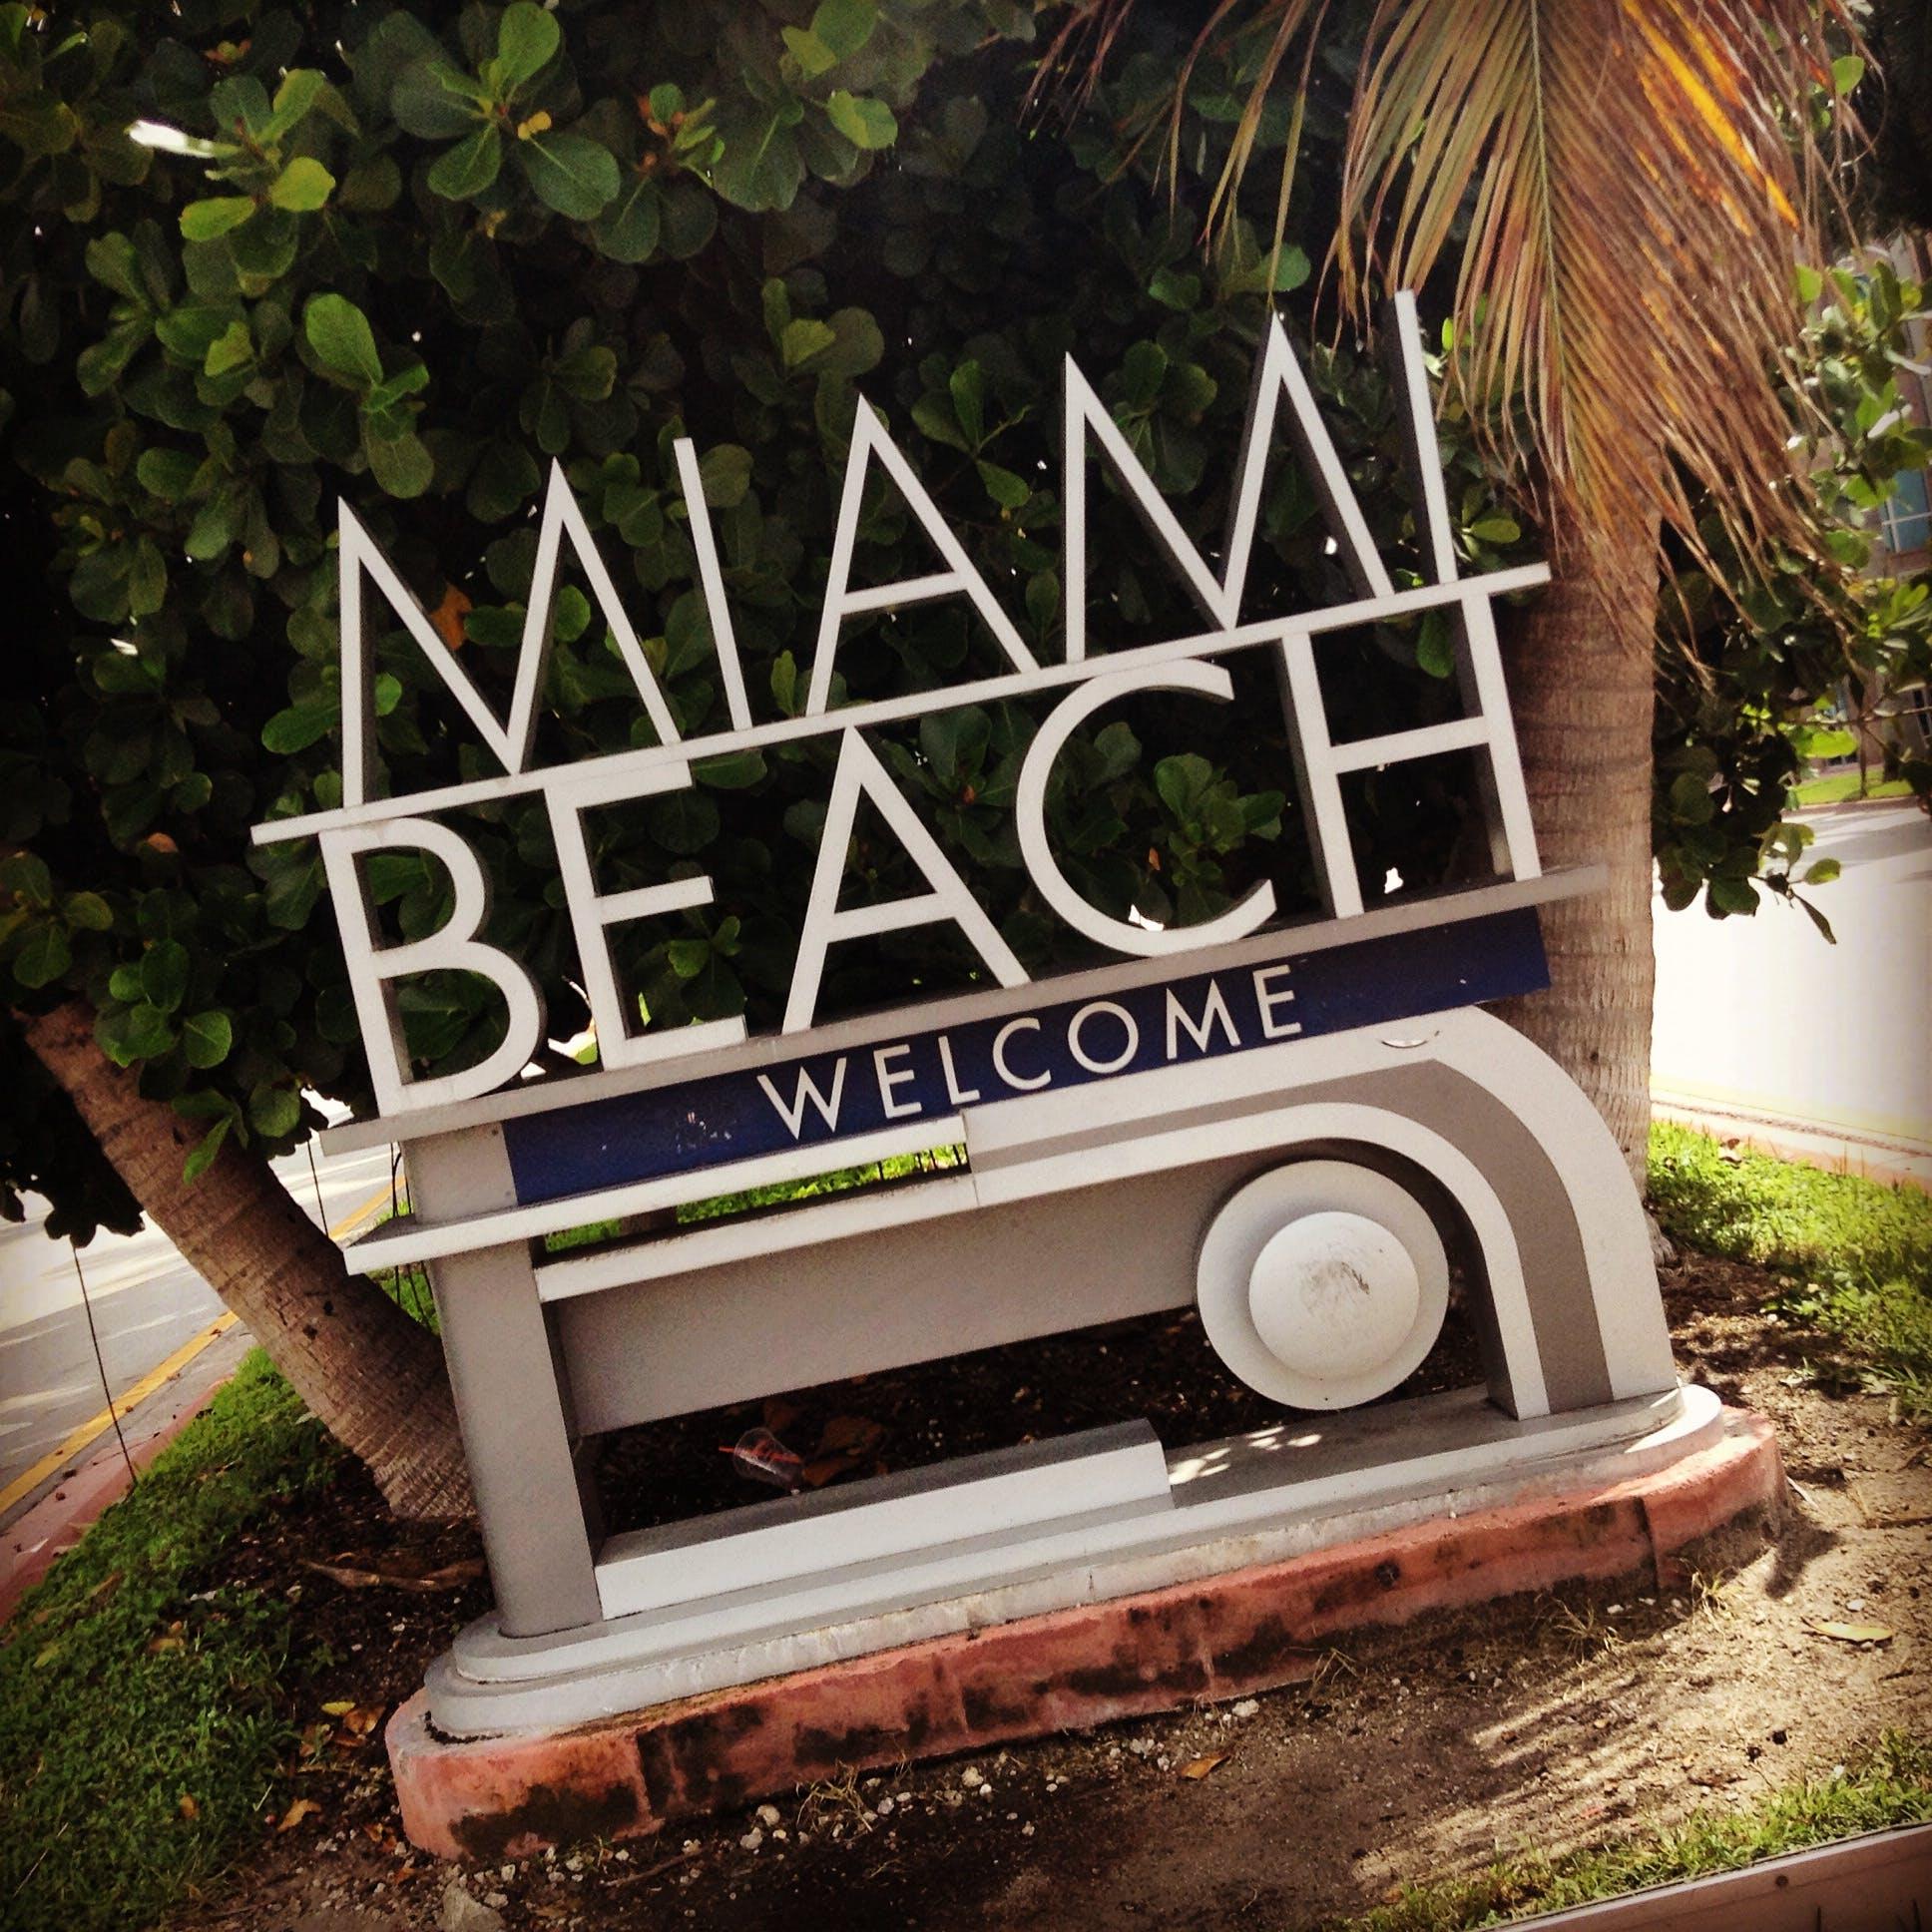 Free stock photo of beach, Miami Beach, travel destinations, traveling